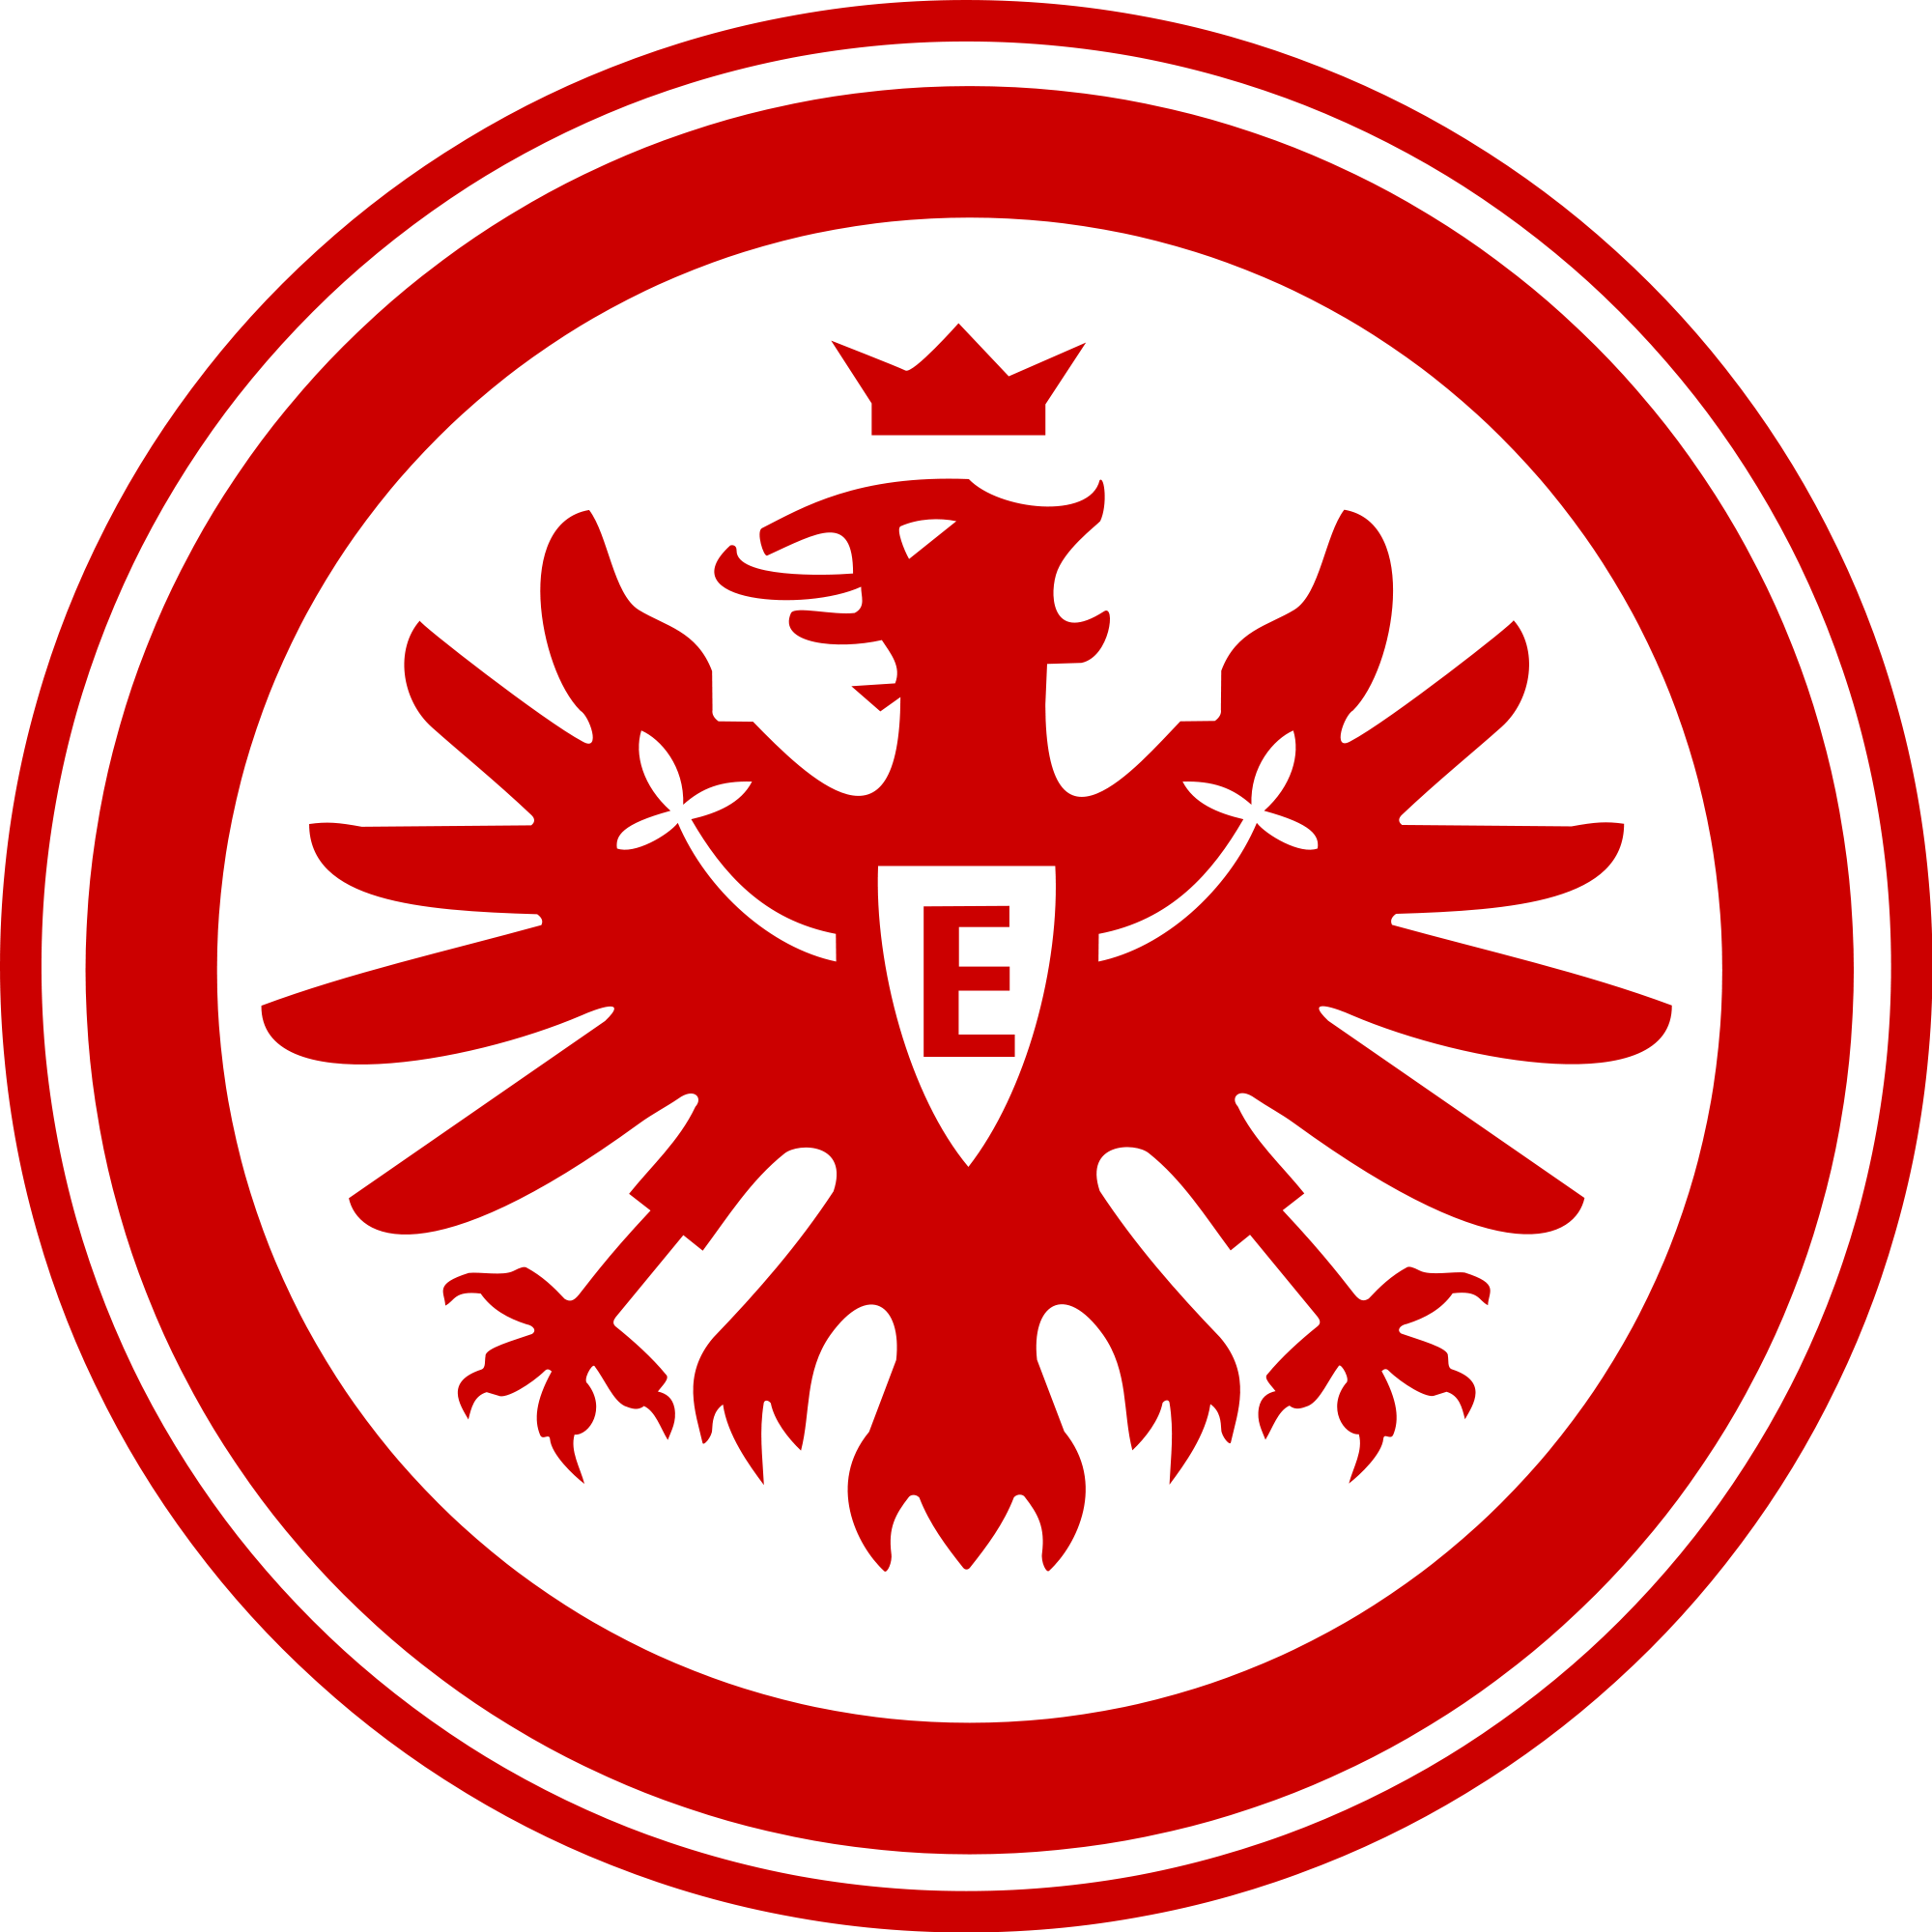 Eintracht Frankfurt Tabellenplatz